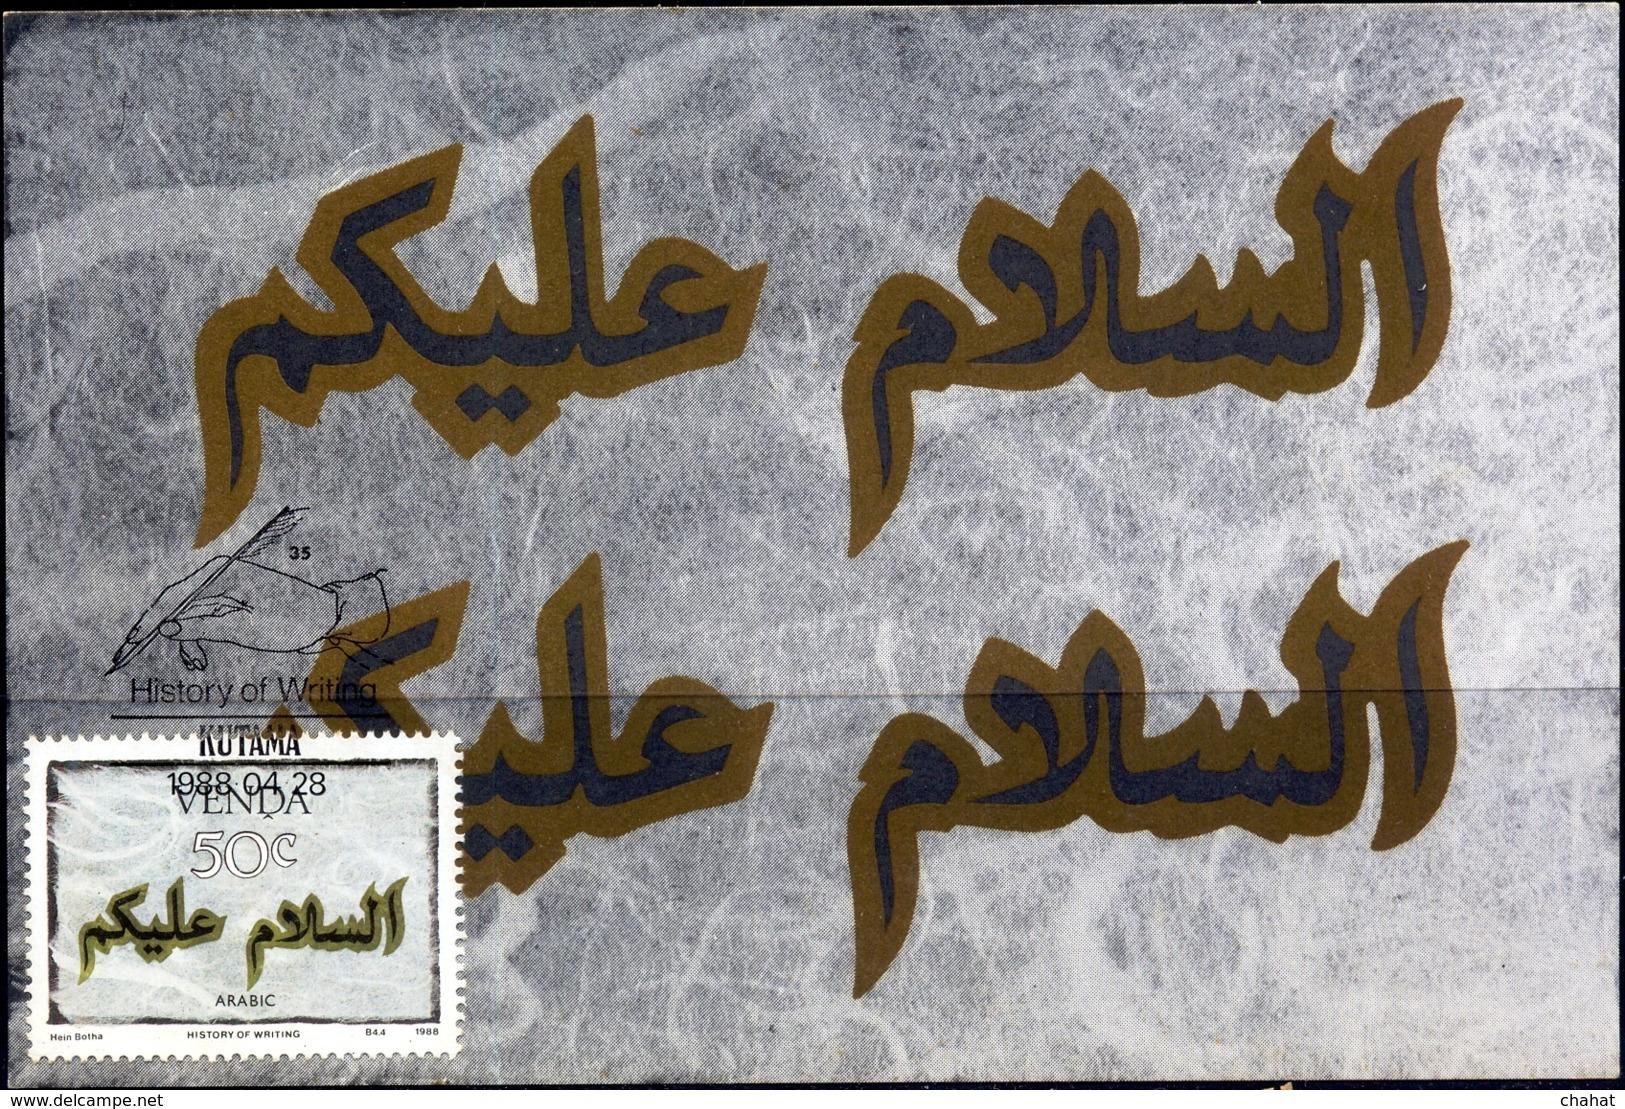 LANGUAGES - ART OF CALLIGRAPHY- ARABIC - MAXIMUM CARD- VENDA-1988-MNH-MC-51 - Sprachen